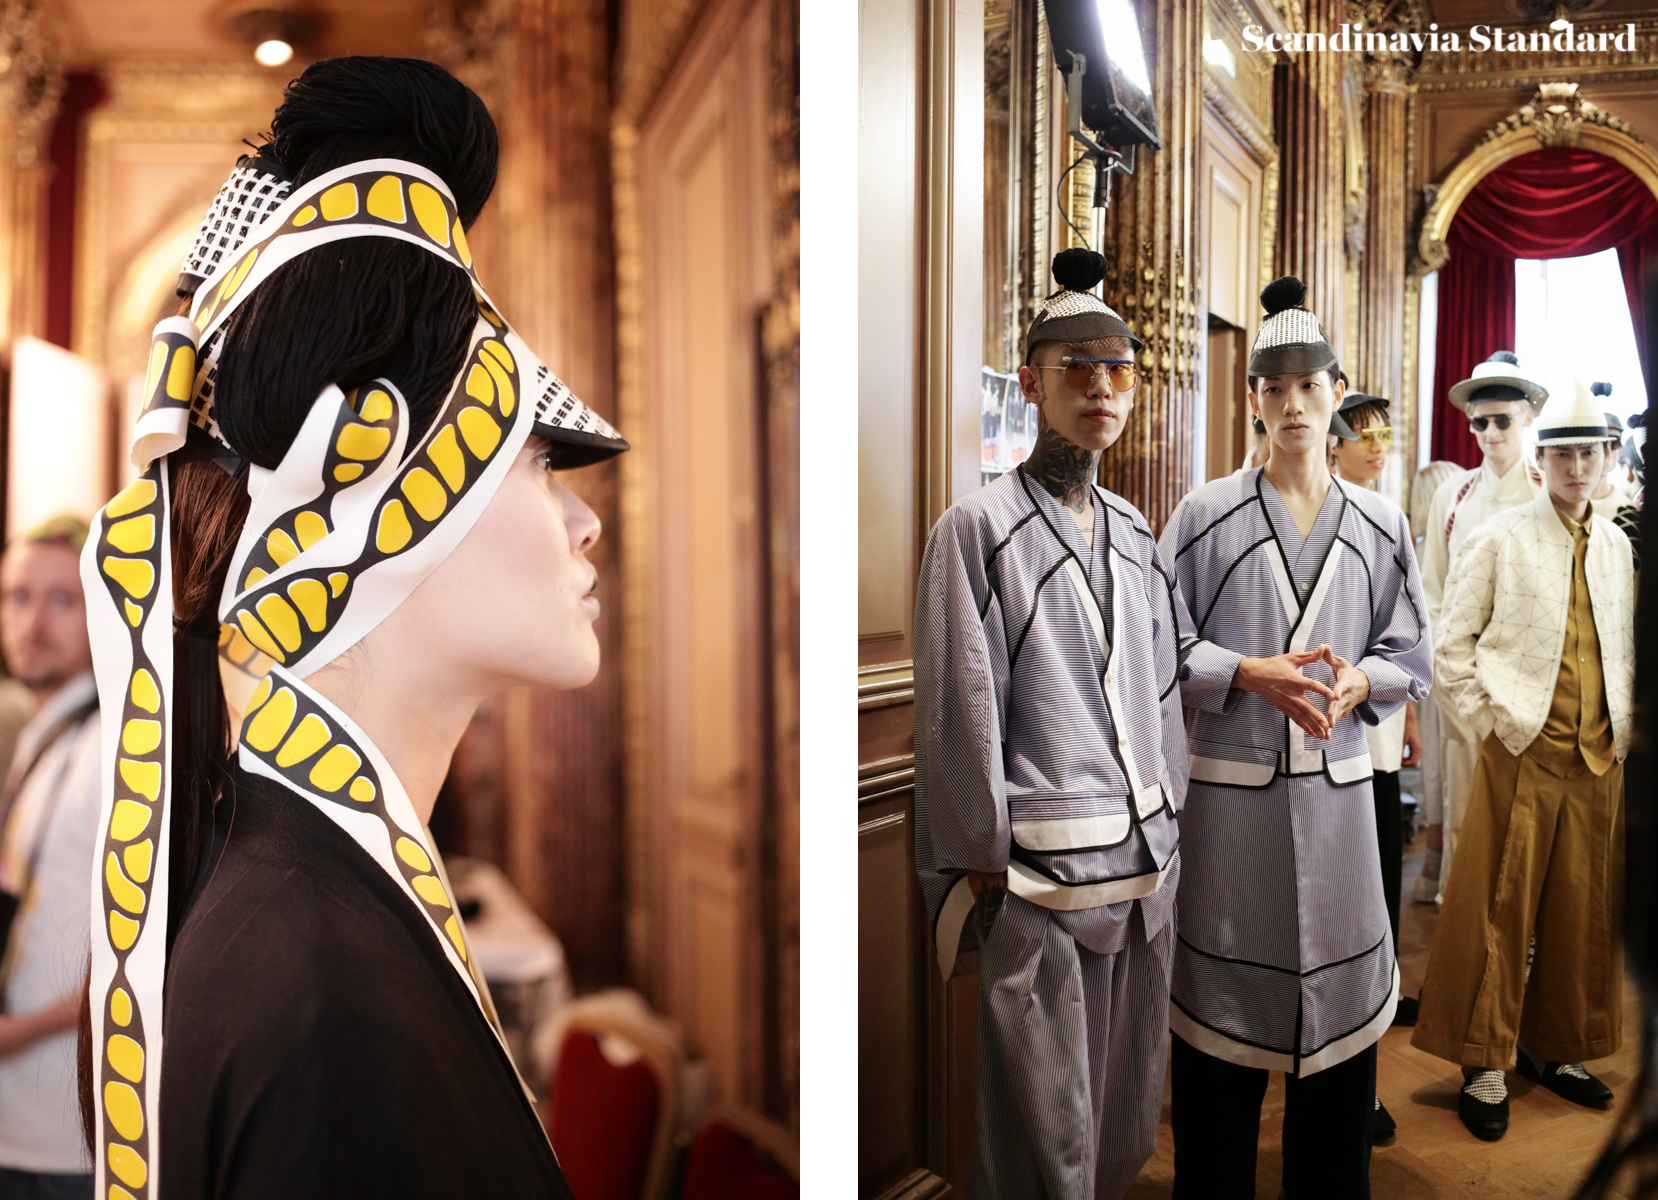 Henrik Vibskov SS17 Paris Fashion Week Men's - J56B6074